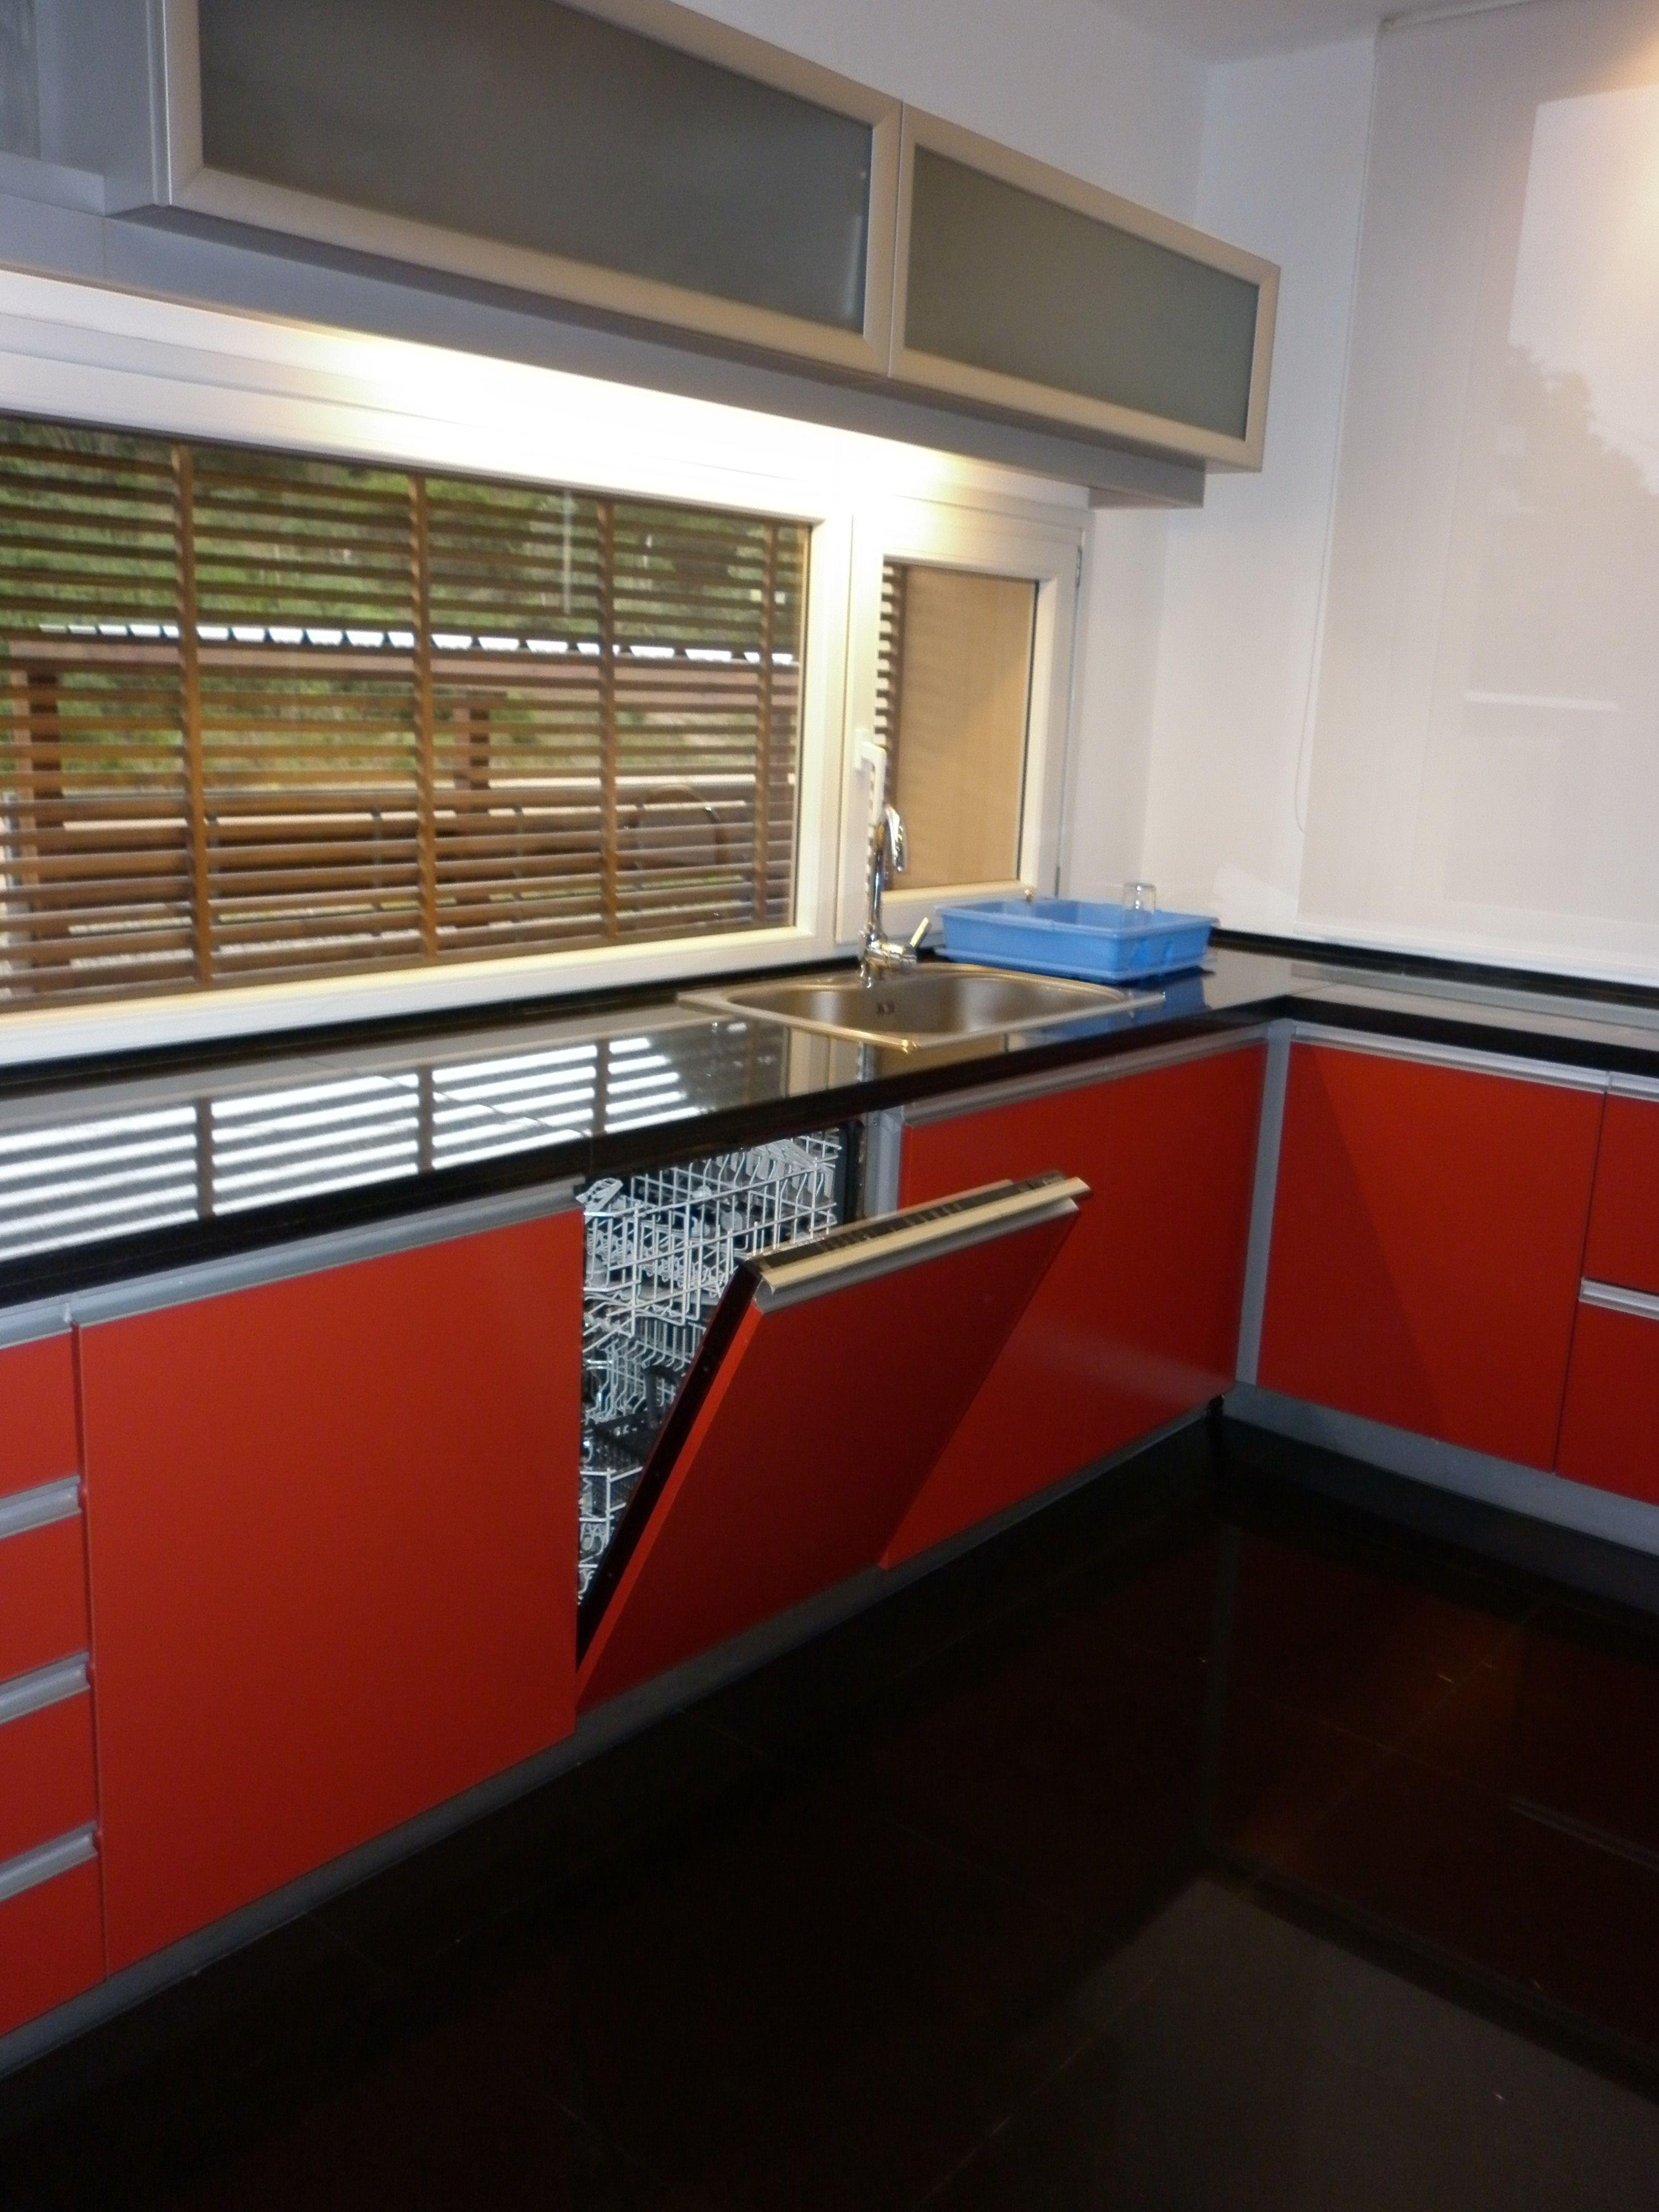 Grupo3 Cocina M Blanco Aluminio Y Vidrio Barra En Bamb  # Muebles De Cocina Faplac